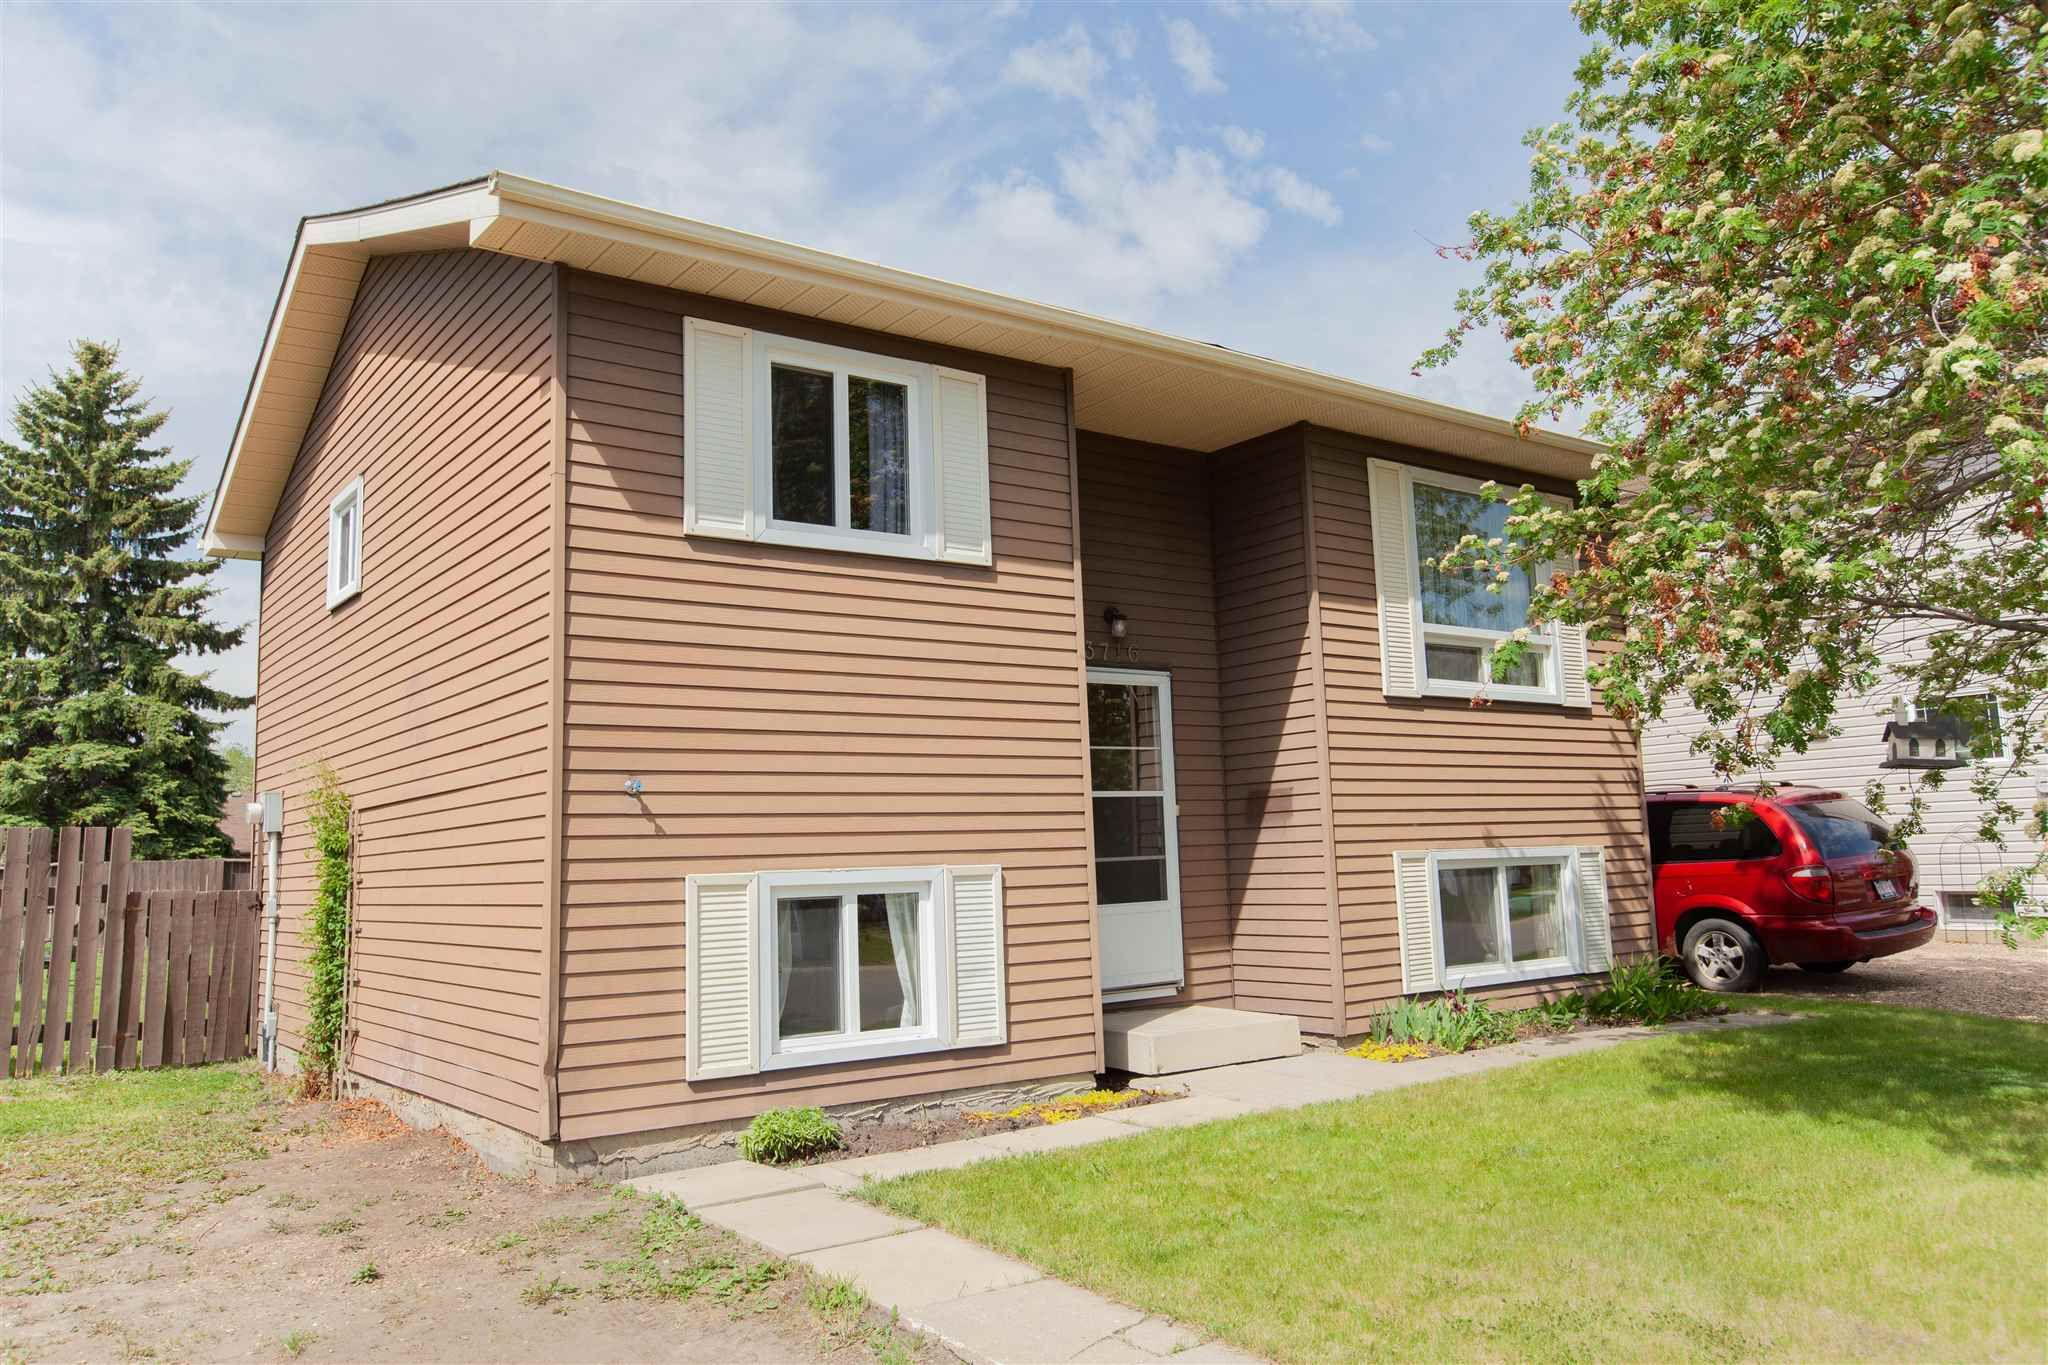 Main Photo: 3716 45 Street in Edmonton: Zone 29 House for sale : MLS®# E4248056